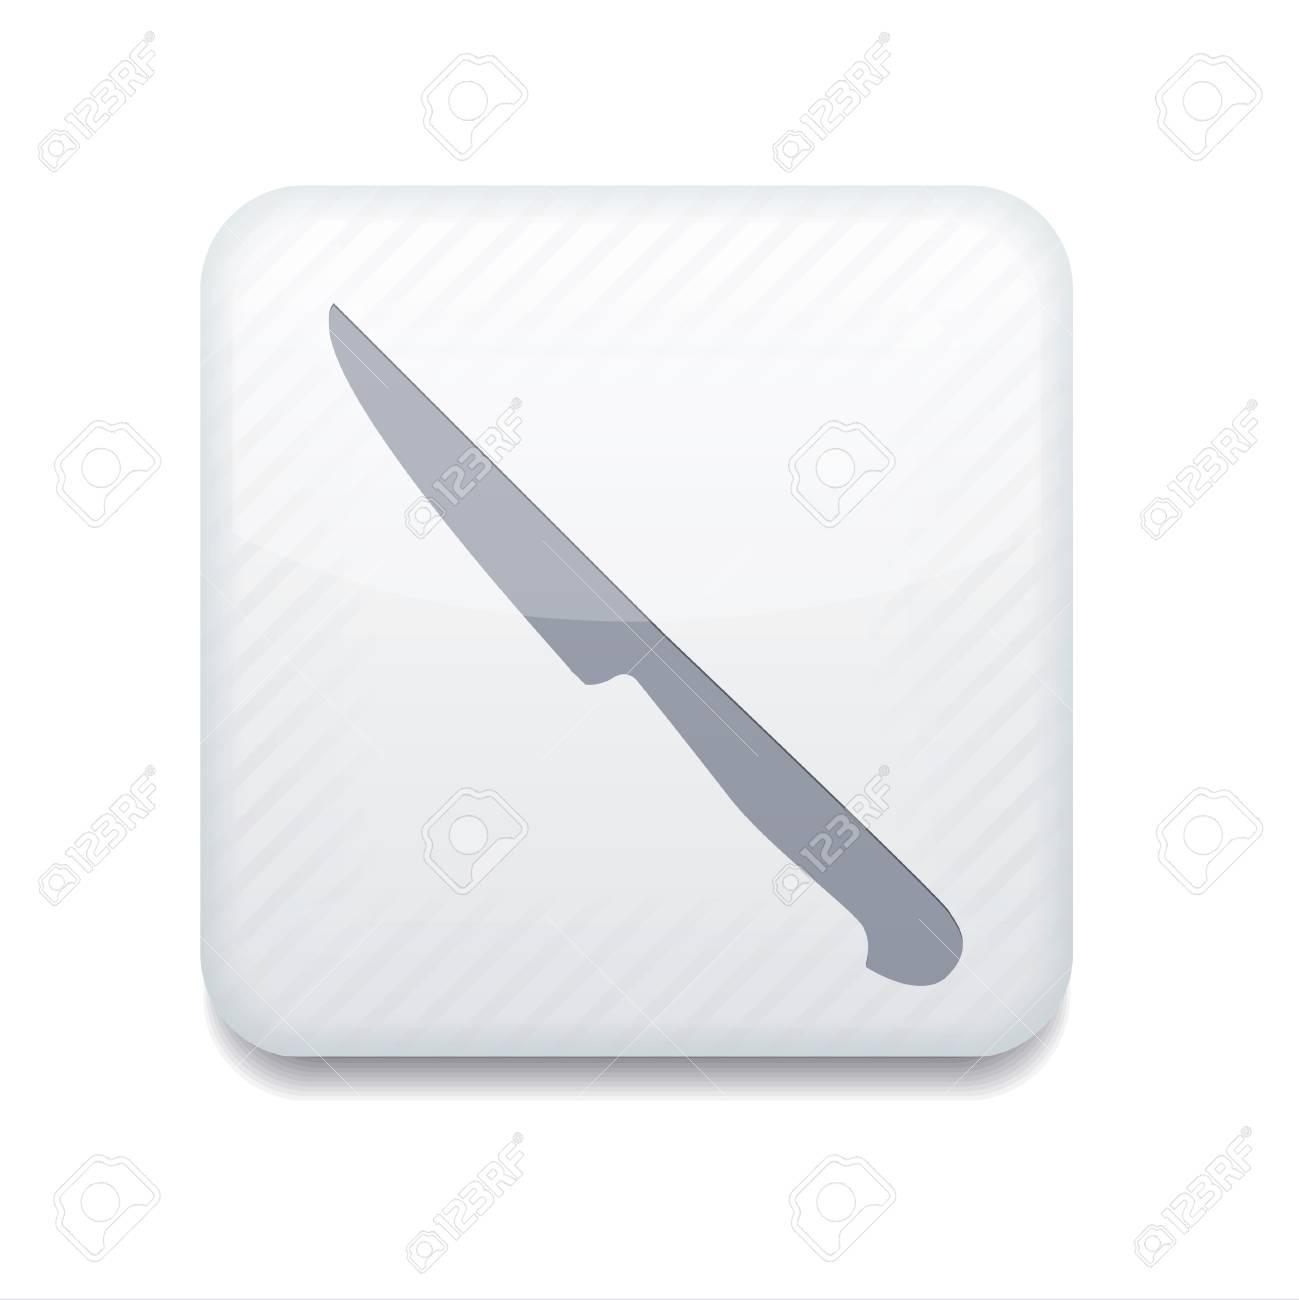 white knife icon. Stock Vector - 15951628